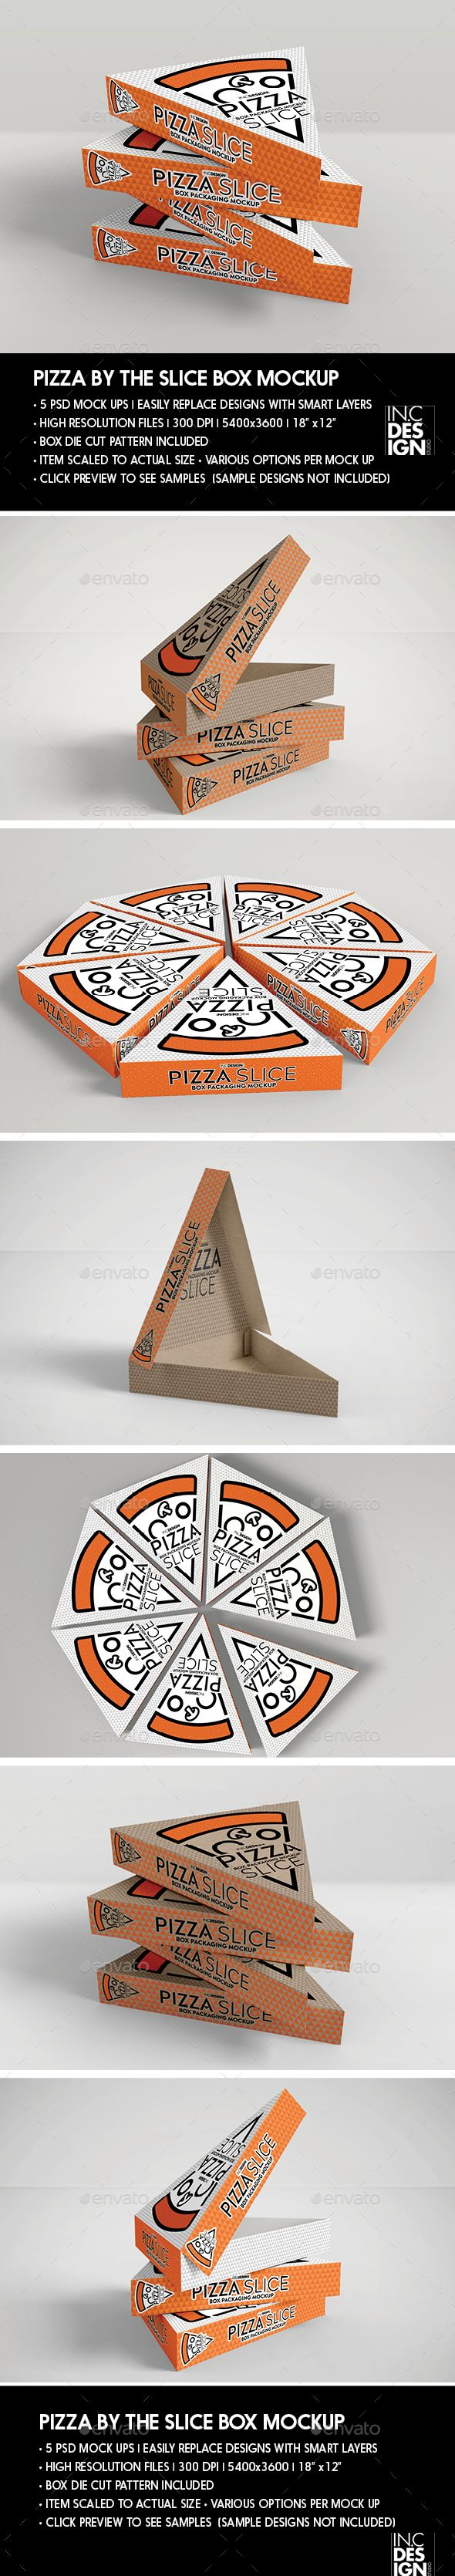 Download Packaging Mockup Pizza Slice Box Professional Shoe Box Mockup Fully Customizable Design Identity Mockup Productmockup Packaging Shoebox 3dbox Kemasan